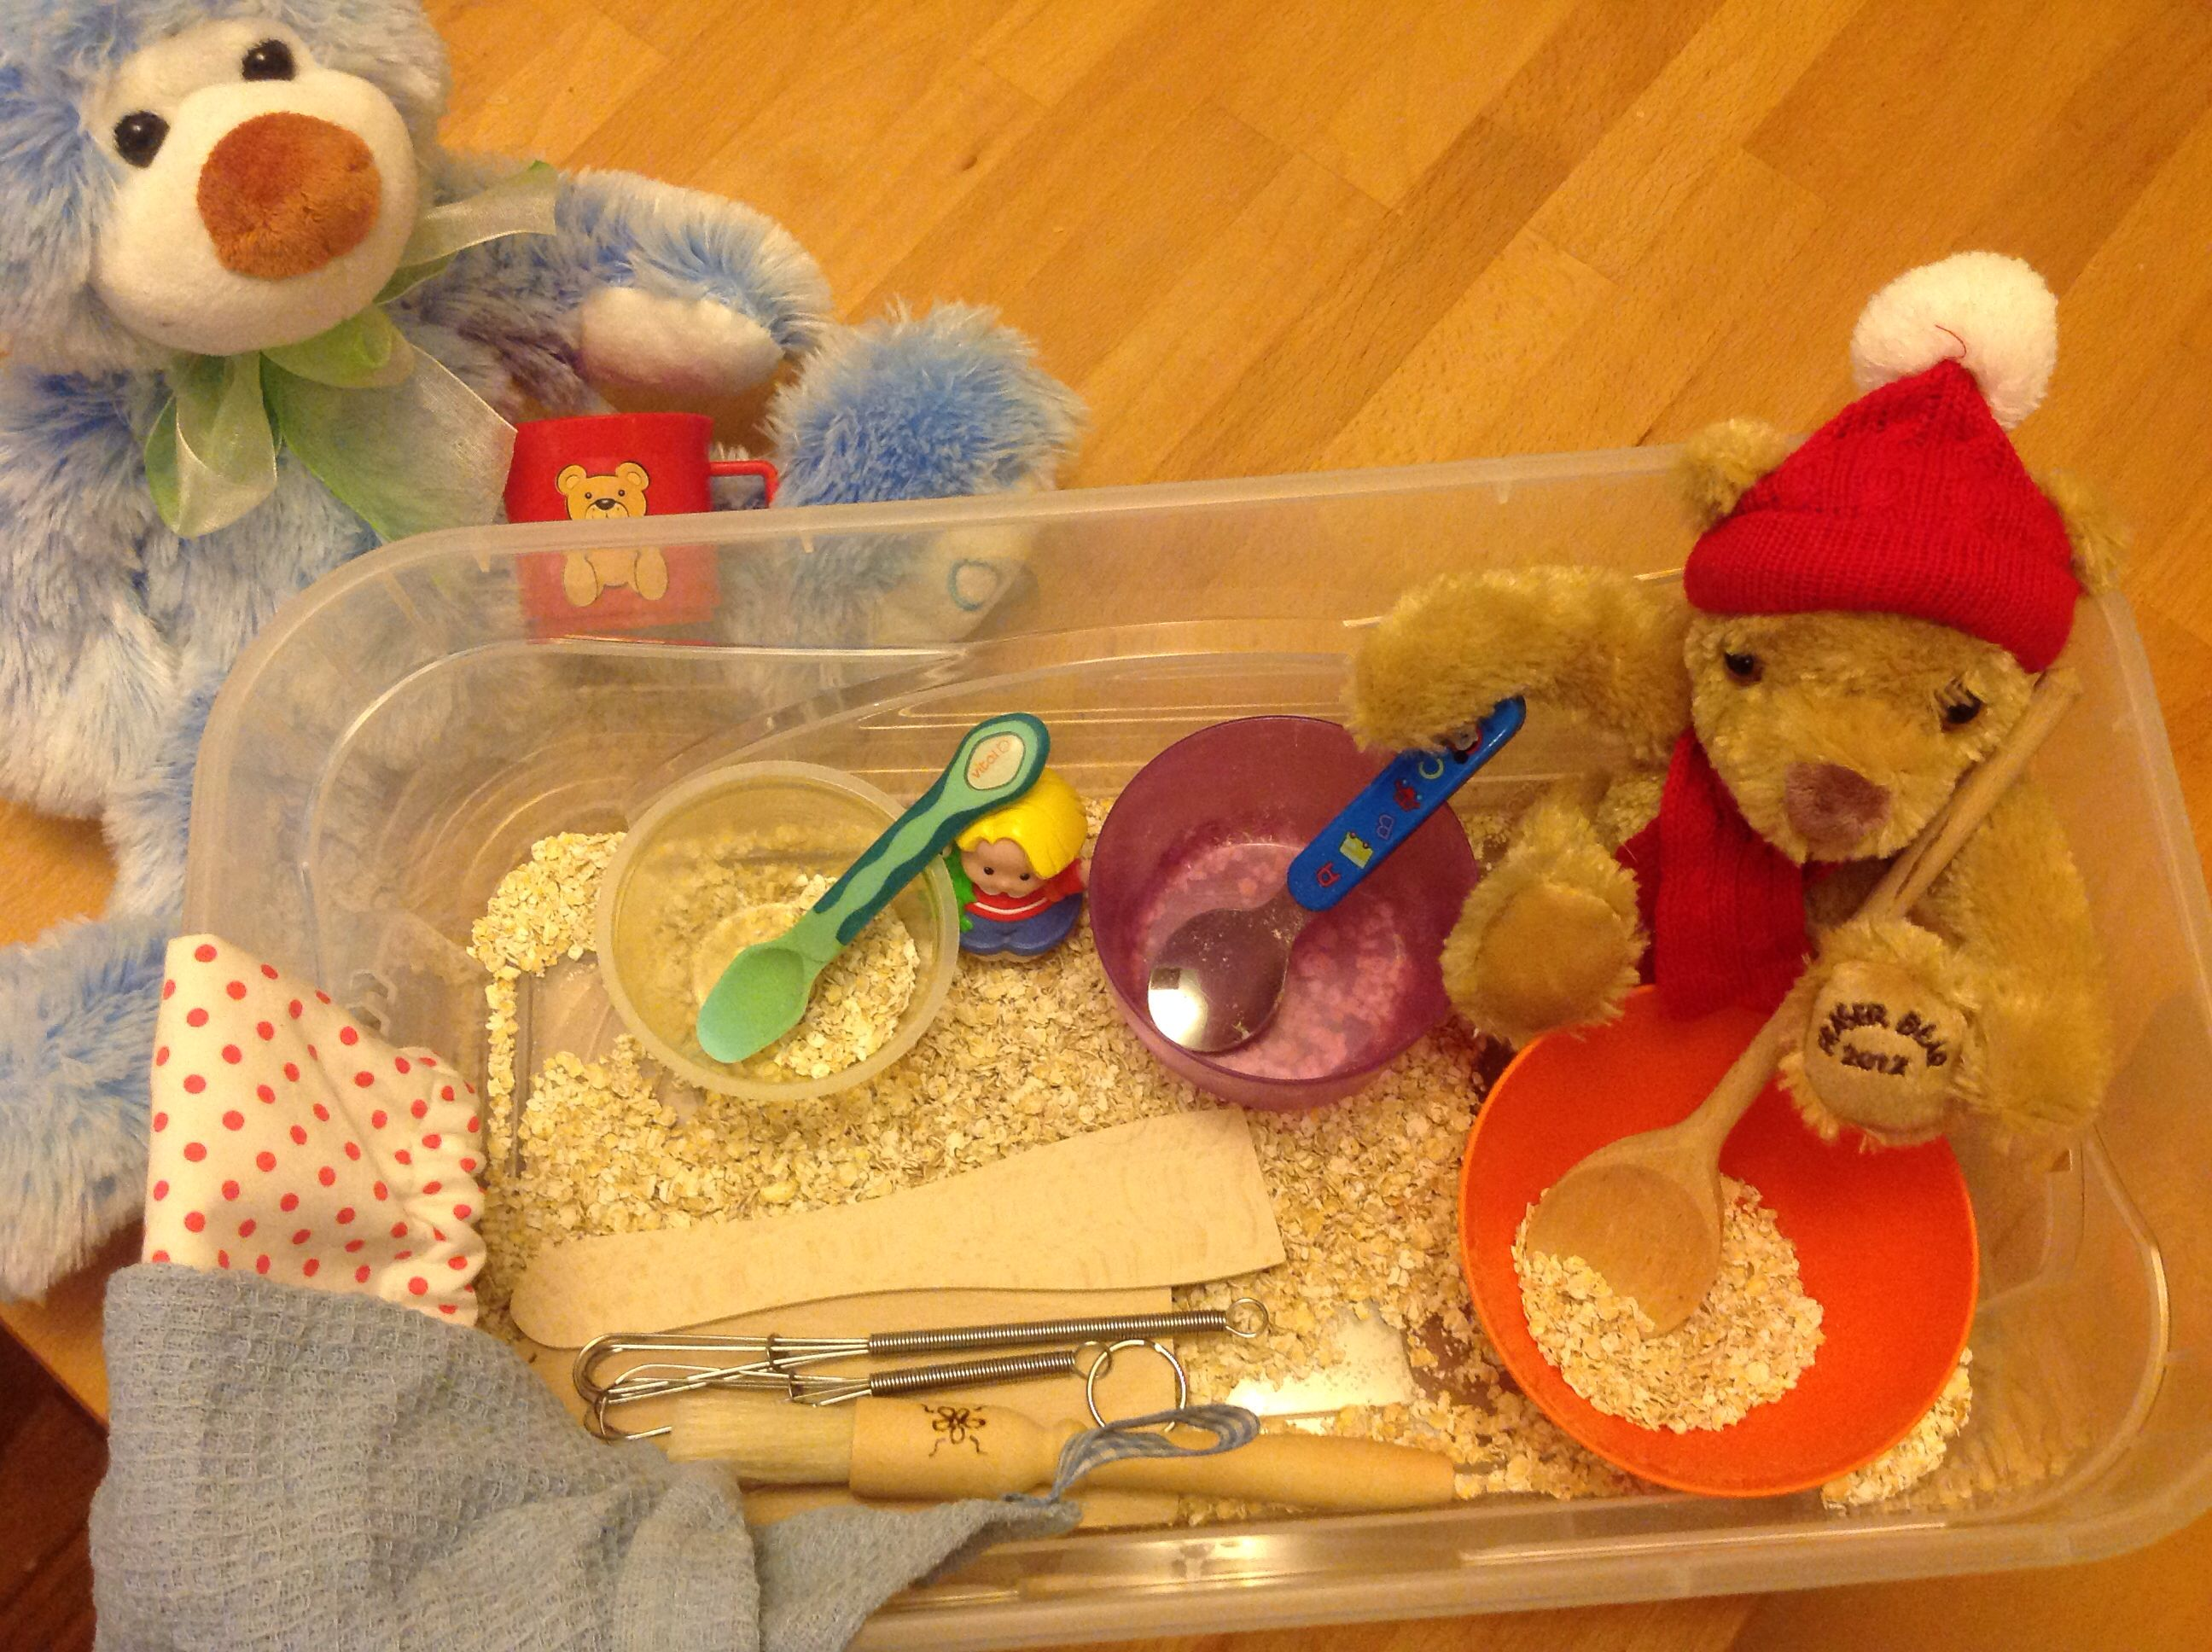 Goldilocks and the Three Bears sensory tub - with cinnamon oats